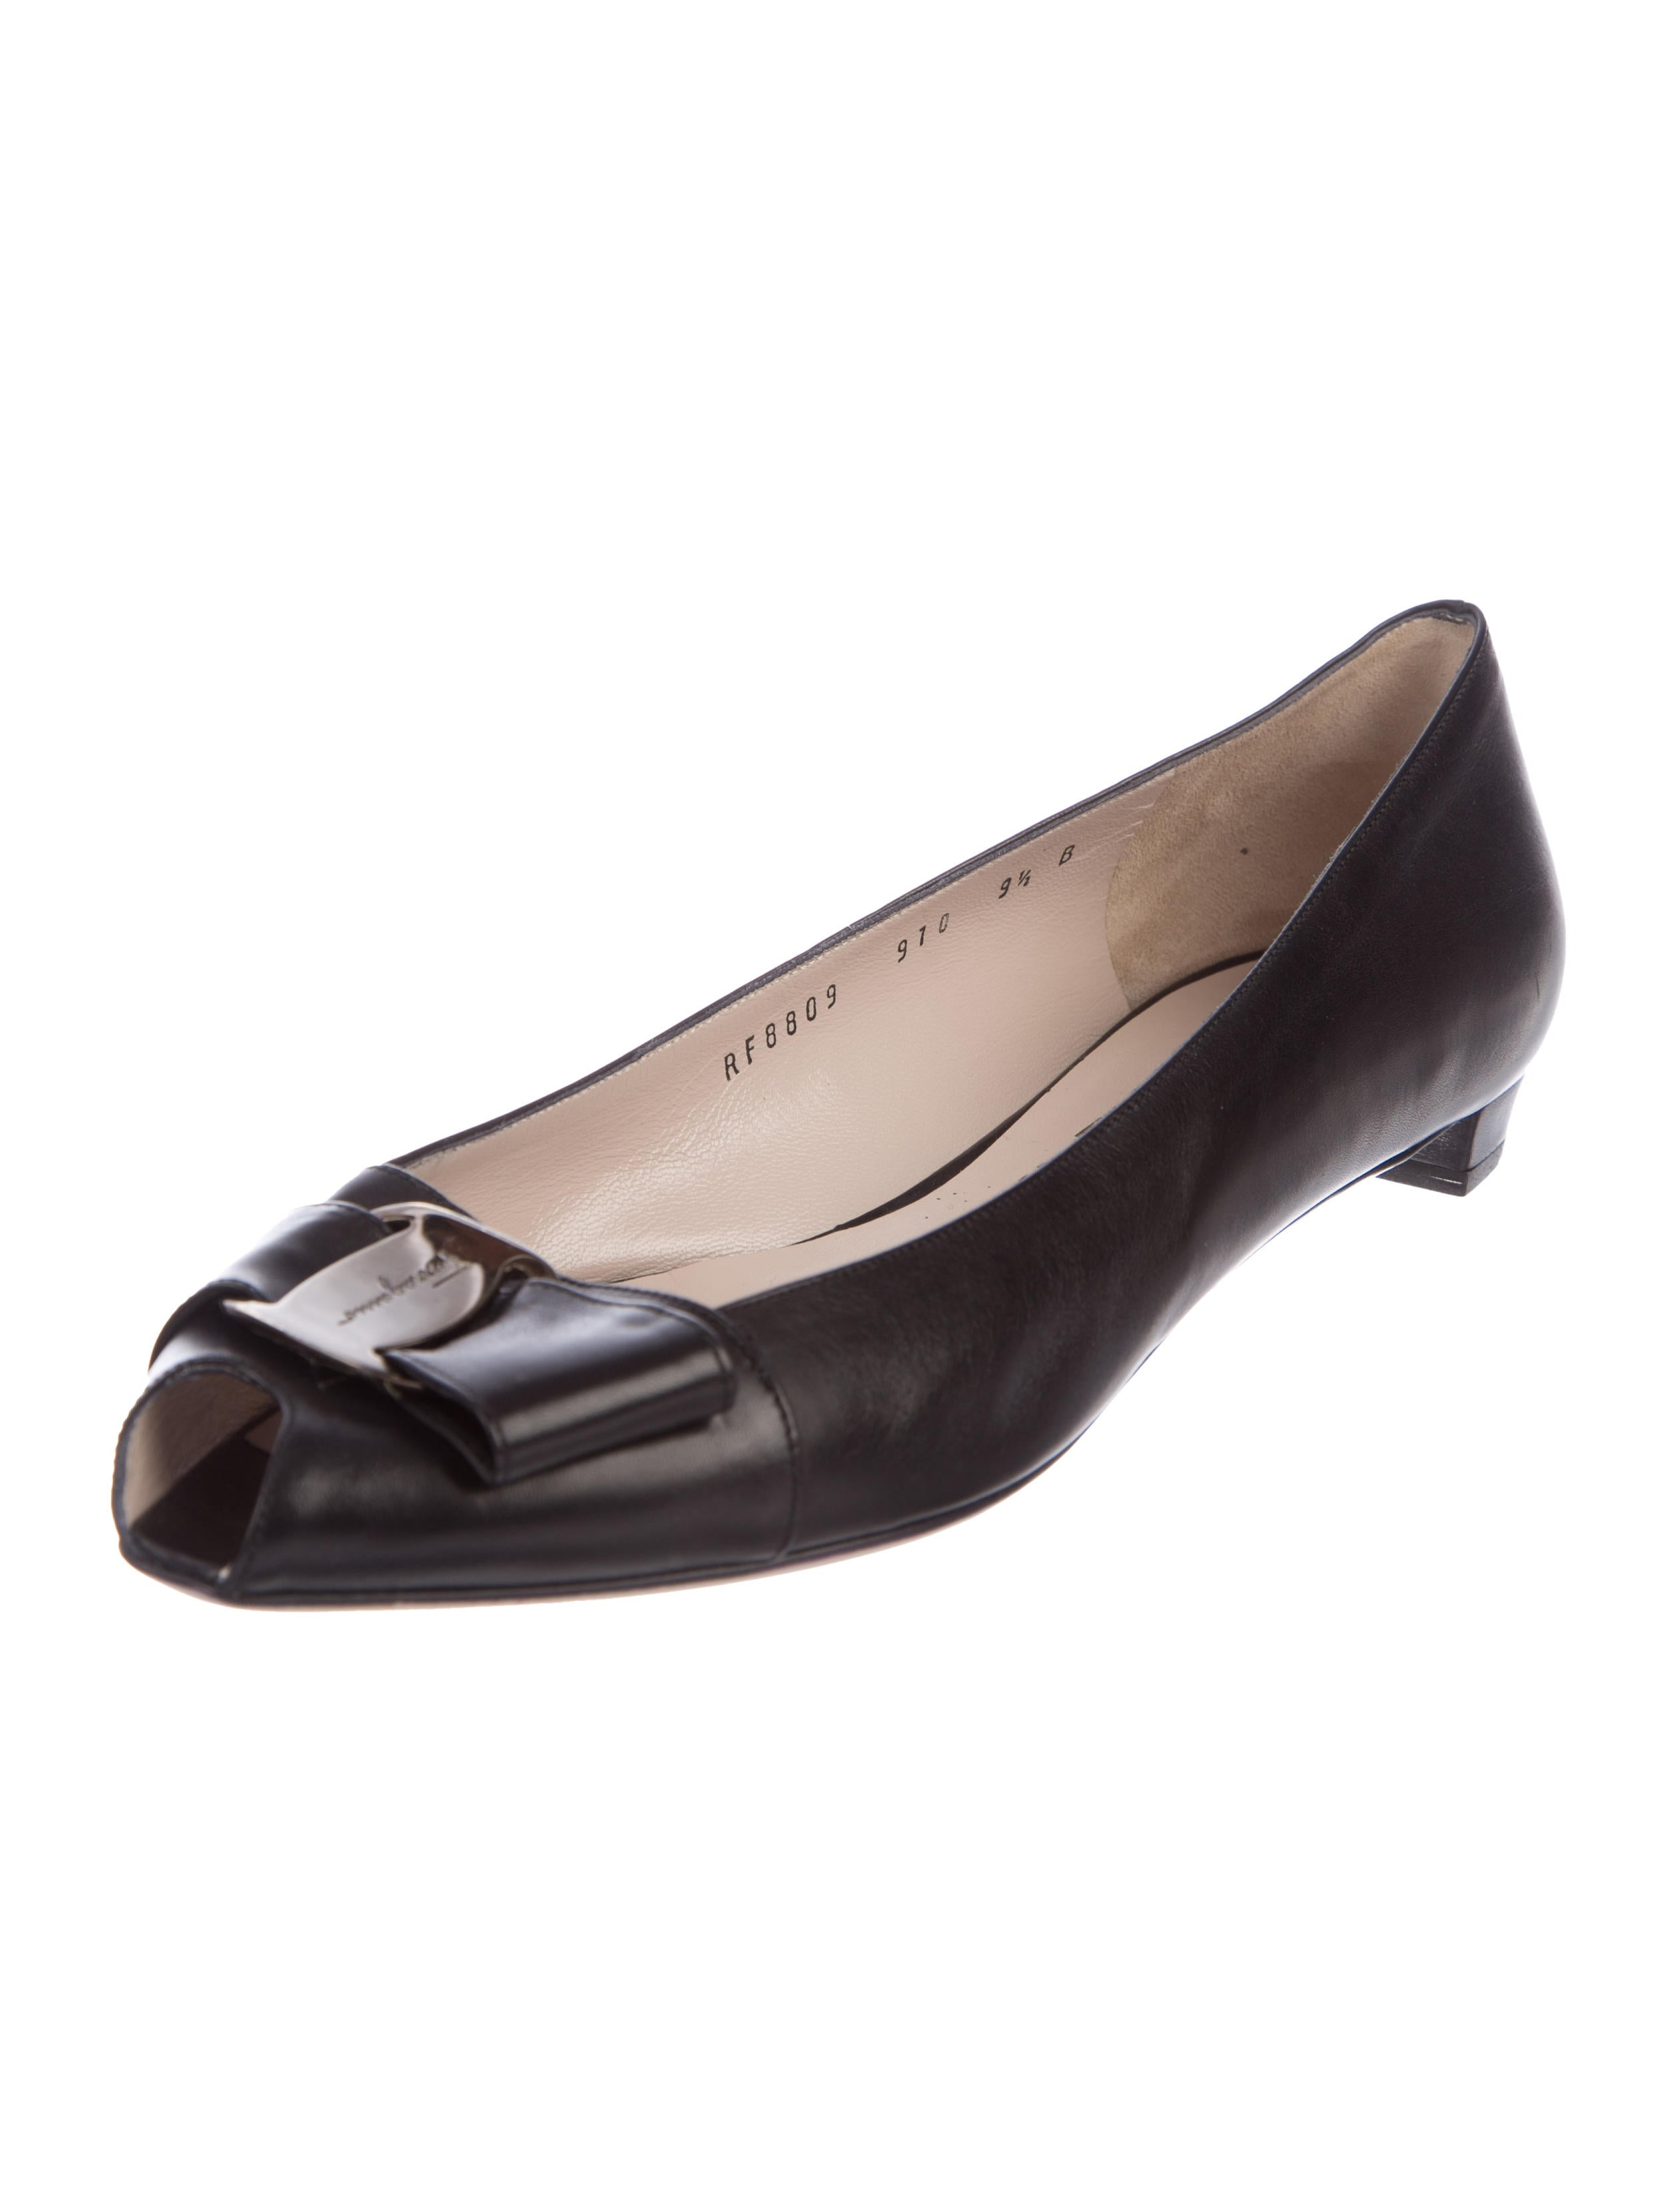 classic cheap online buy cheap 2014 unisex Salvatore Ferragamo Maxine Peep-Toe Flats w/ Tags 1eczQA